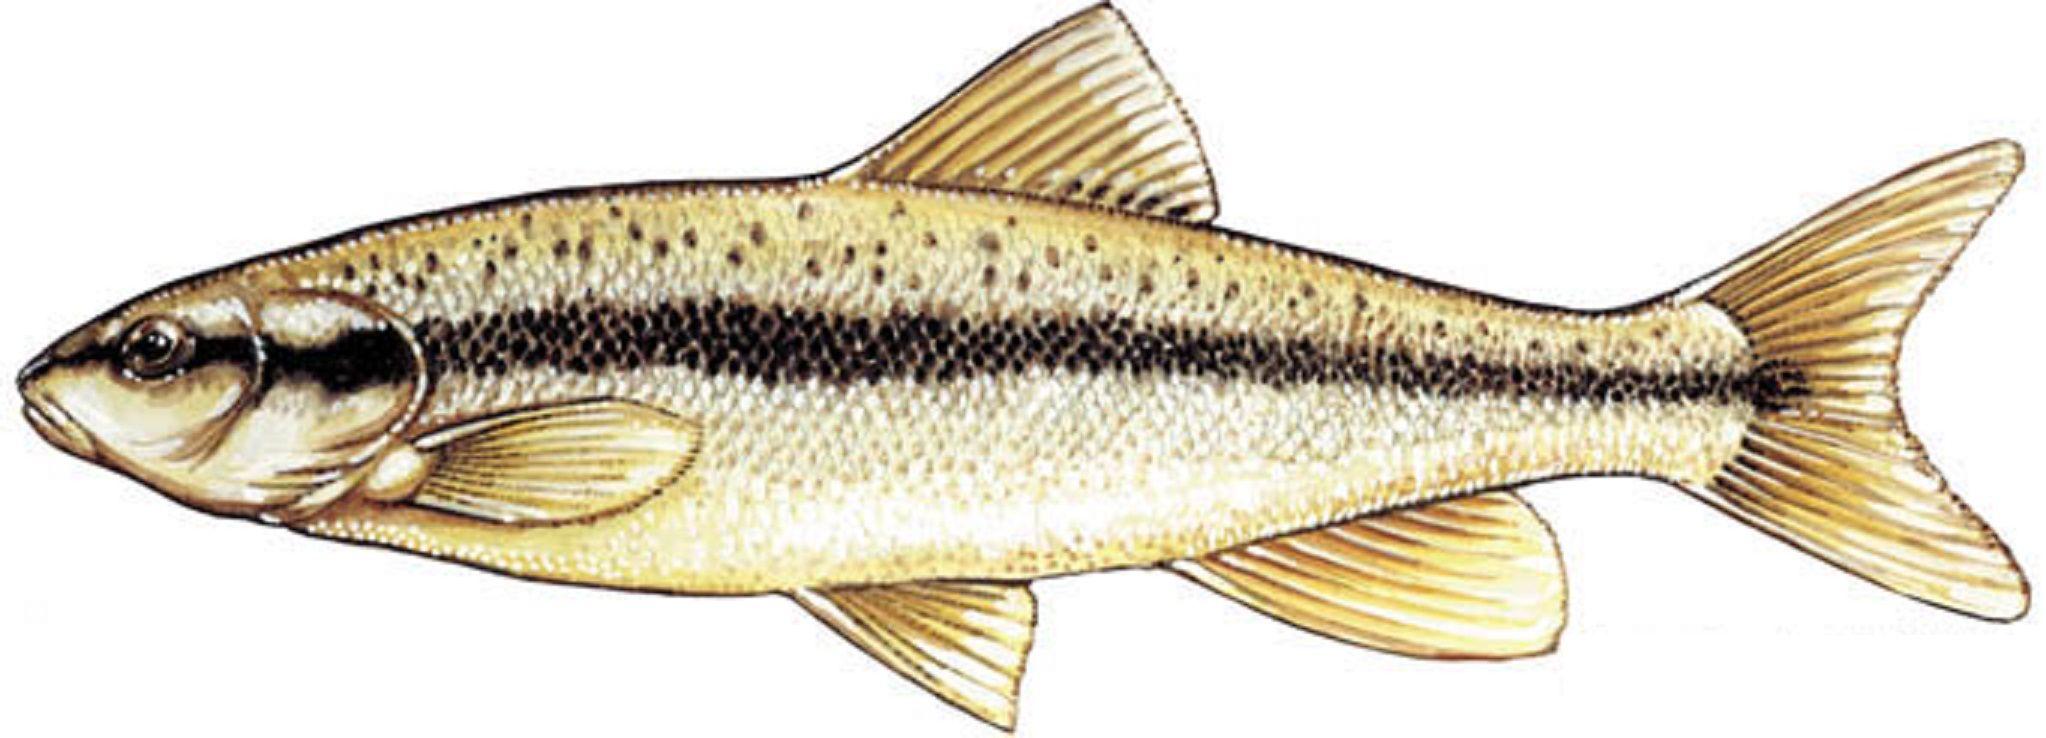 Freshwater fish dace -